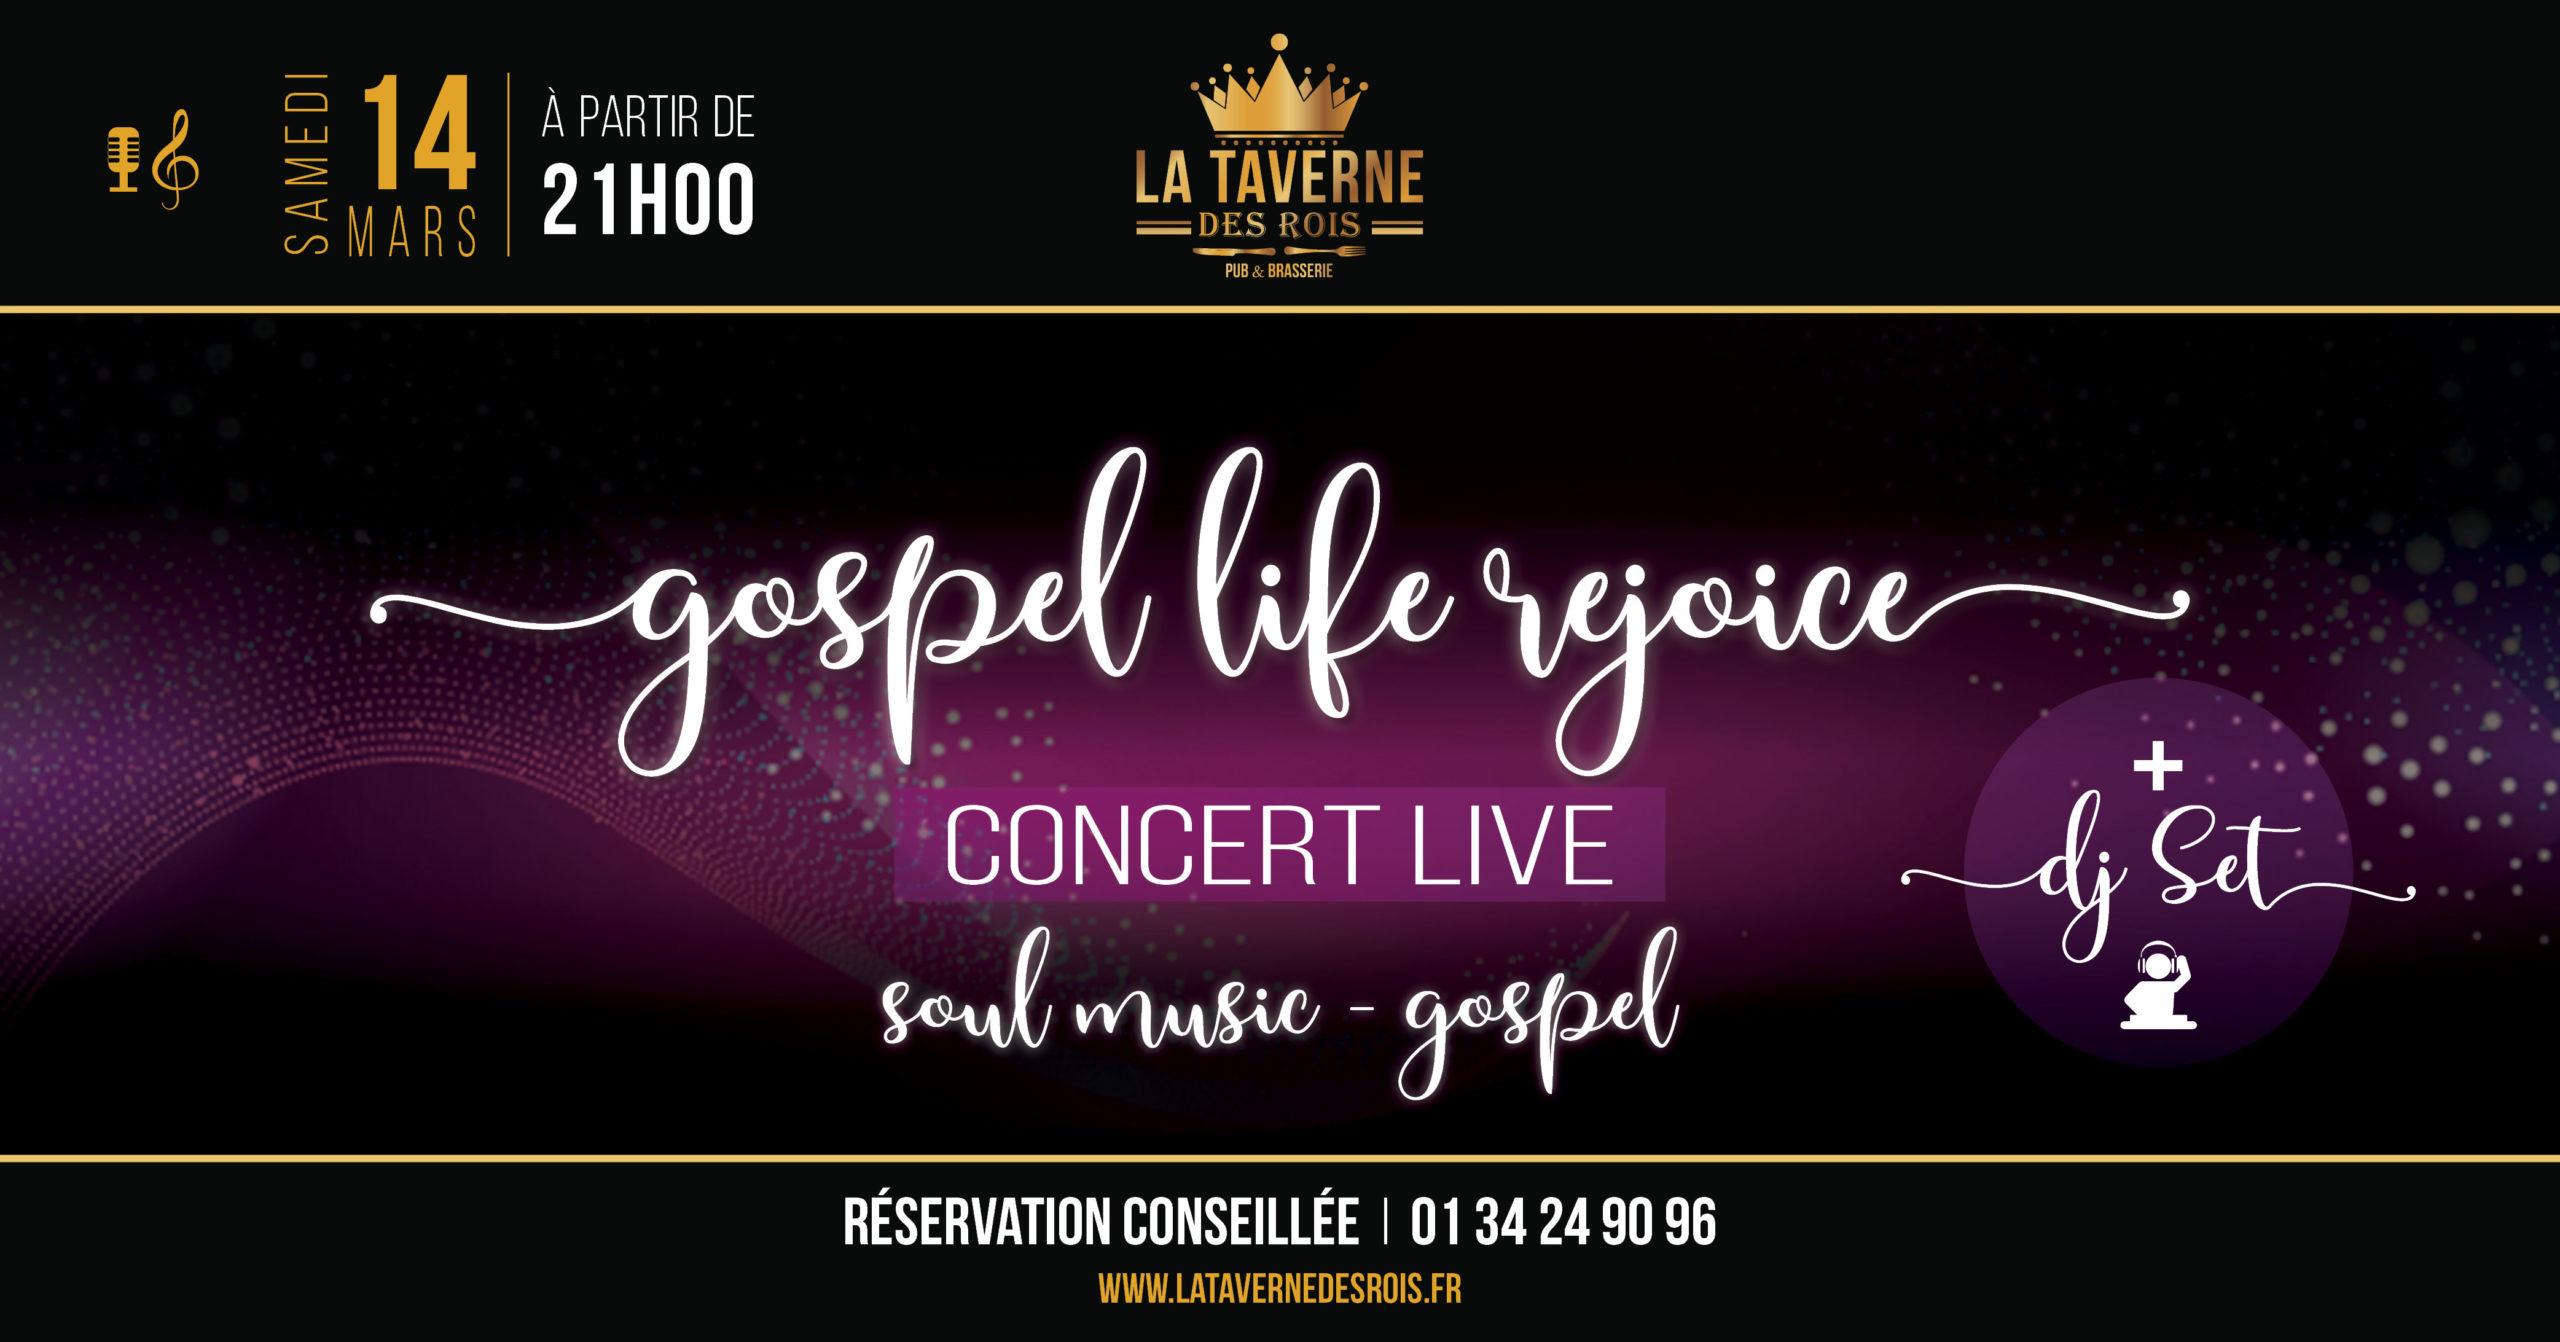 La Taverne des Rois - Gospel Life Rejoice - 14 mars